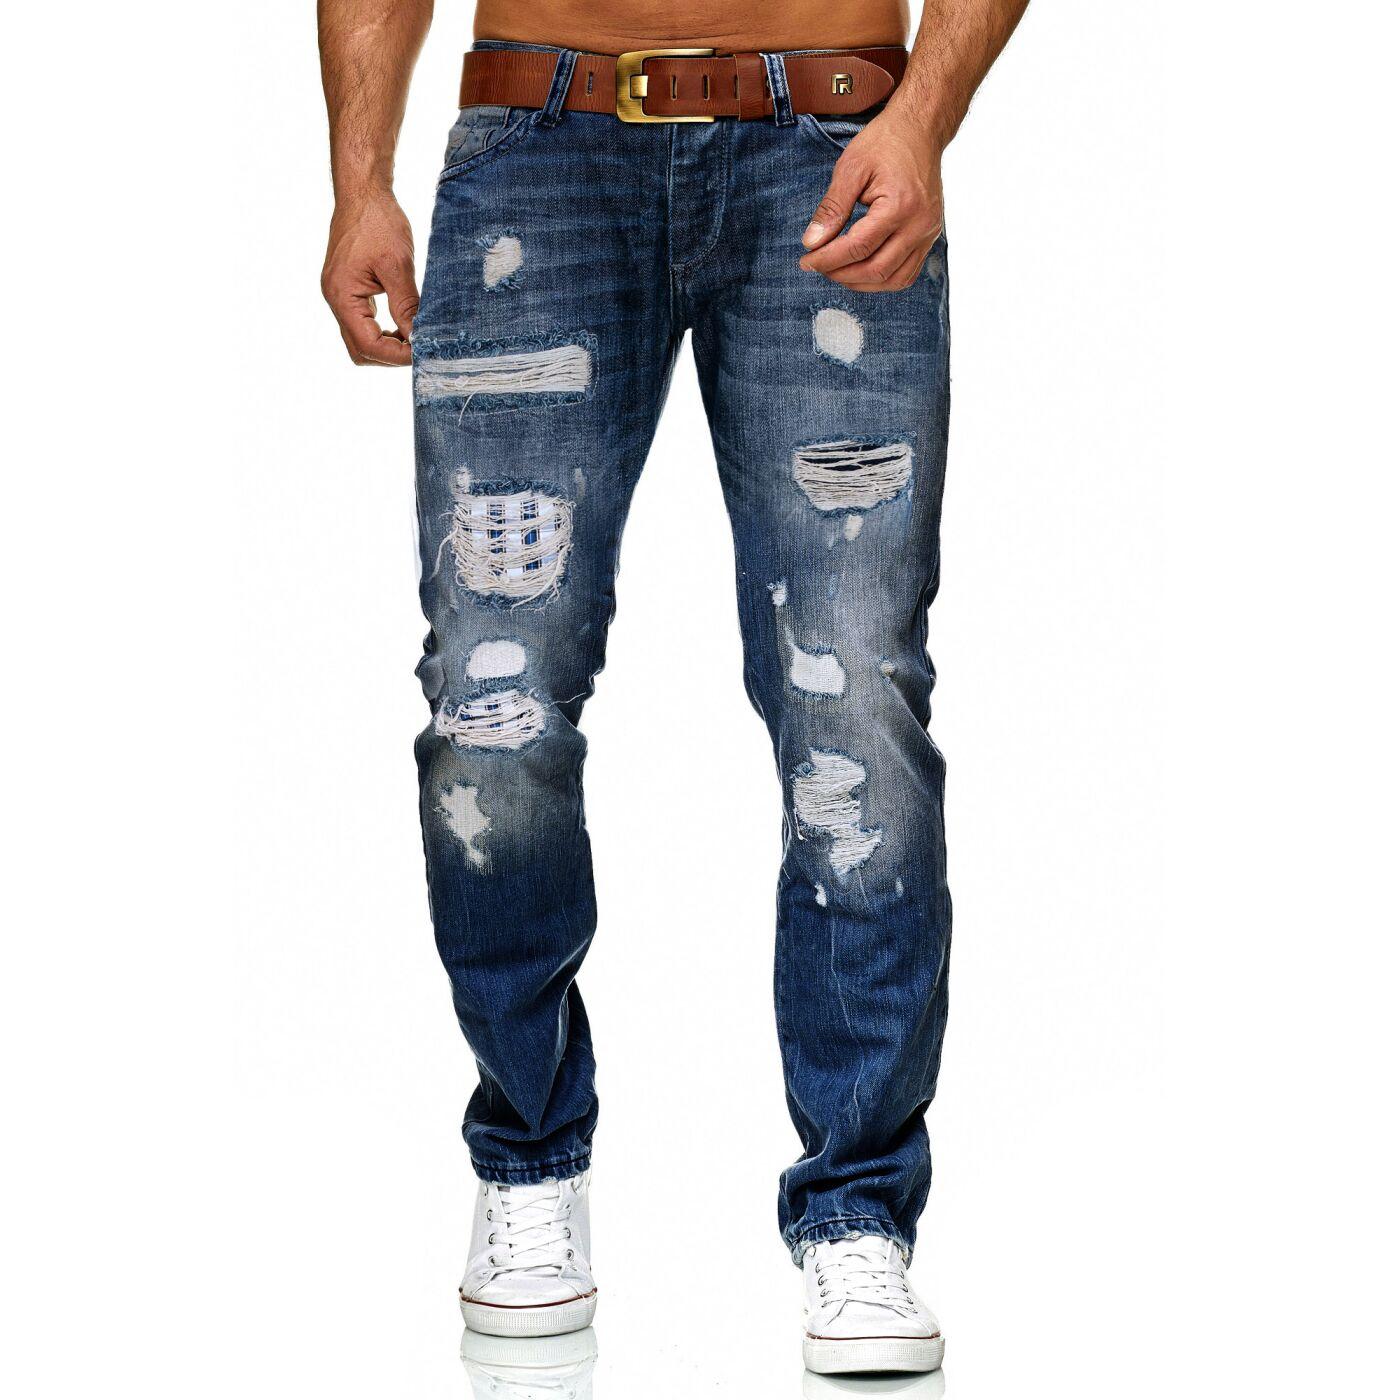 Red Bridge Herren Destroyed Jeans Hose Fashionable Used Look Rb 162